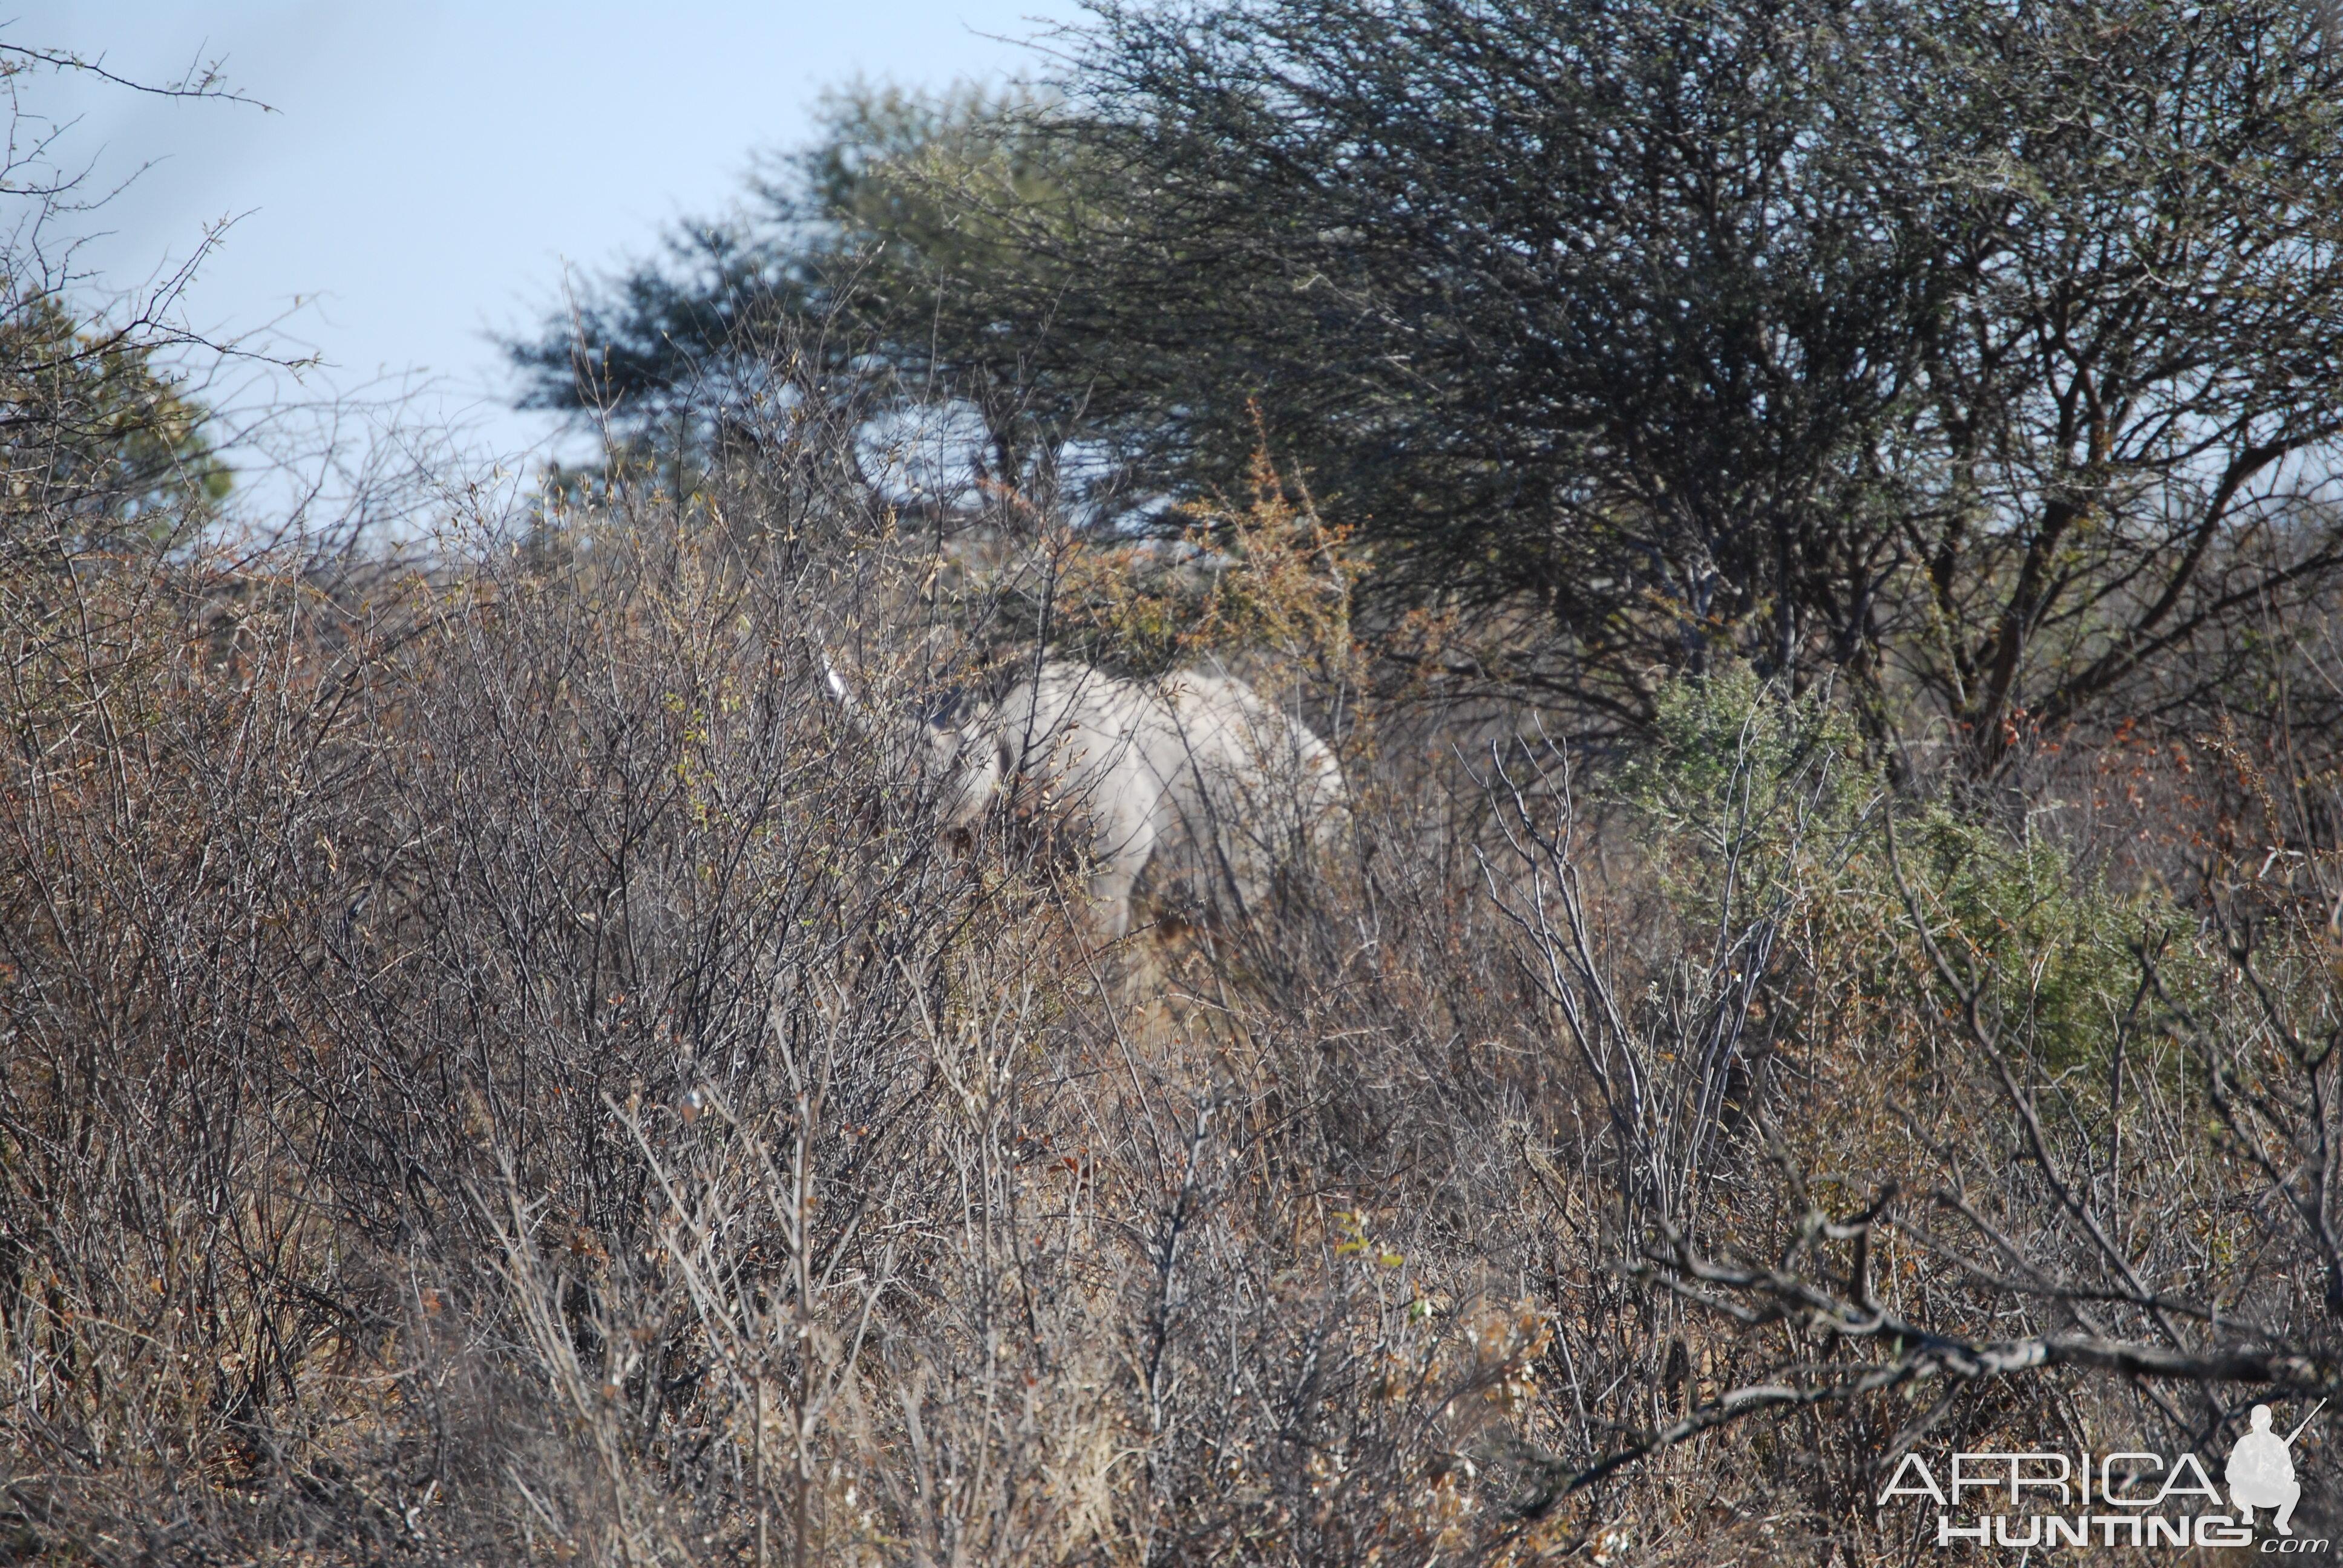 Black Rhino Namibia